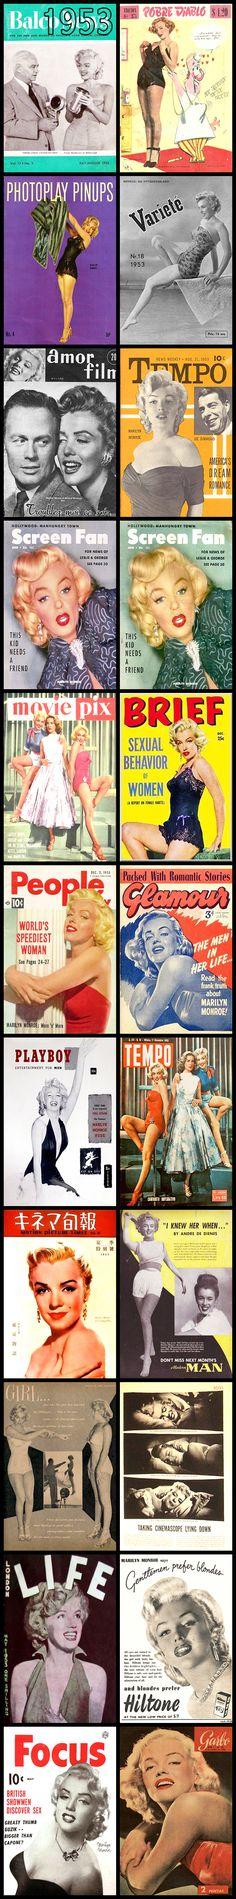 1953 magazine covers of Marilyn Monroe  .... #normajeane #vintagemagazine #pinup #iconic #raremagazine #magazinecover #hollywoodactress #monroe #marilyn #1950s